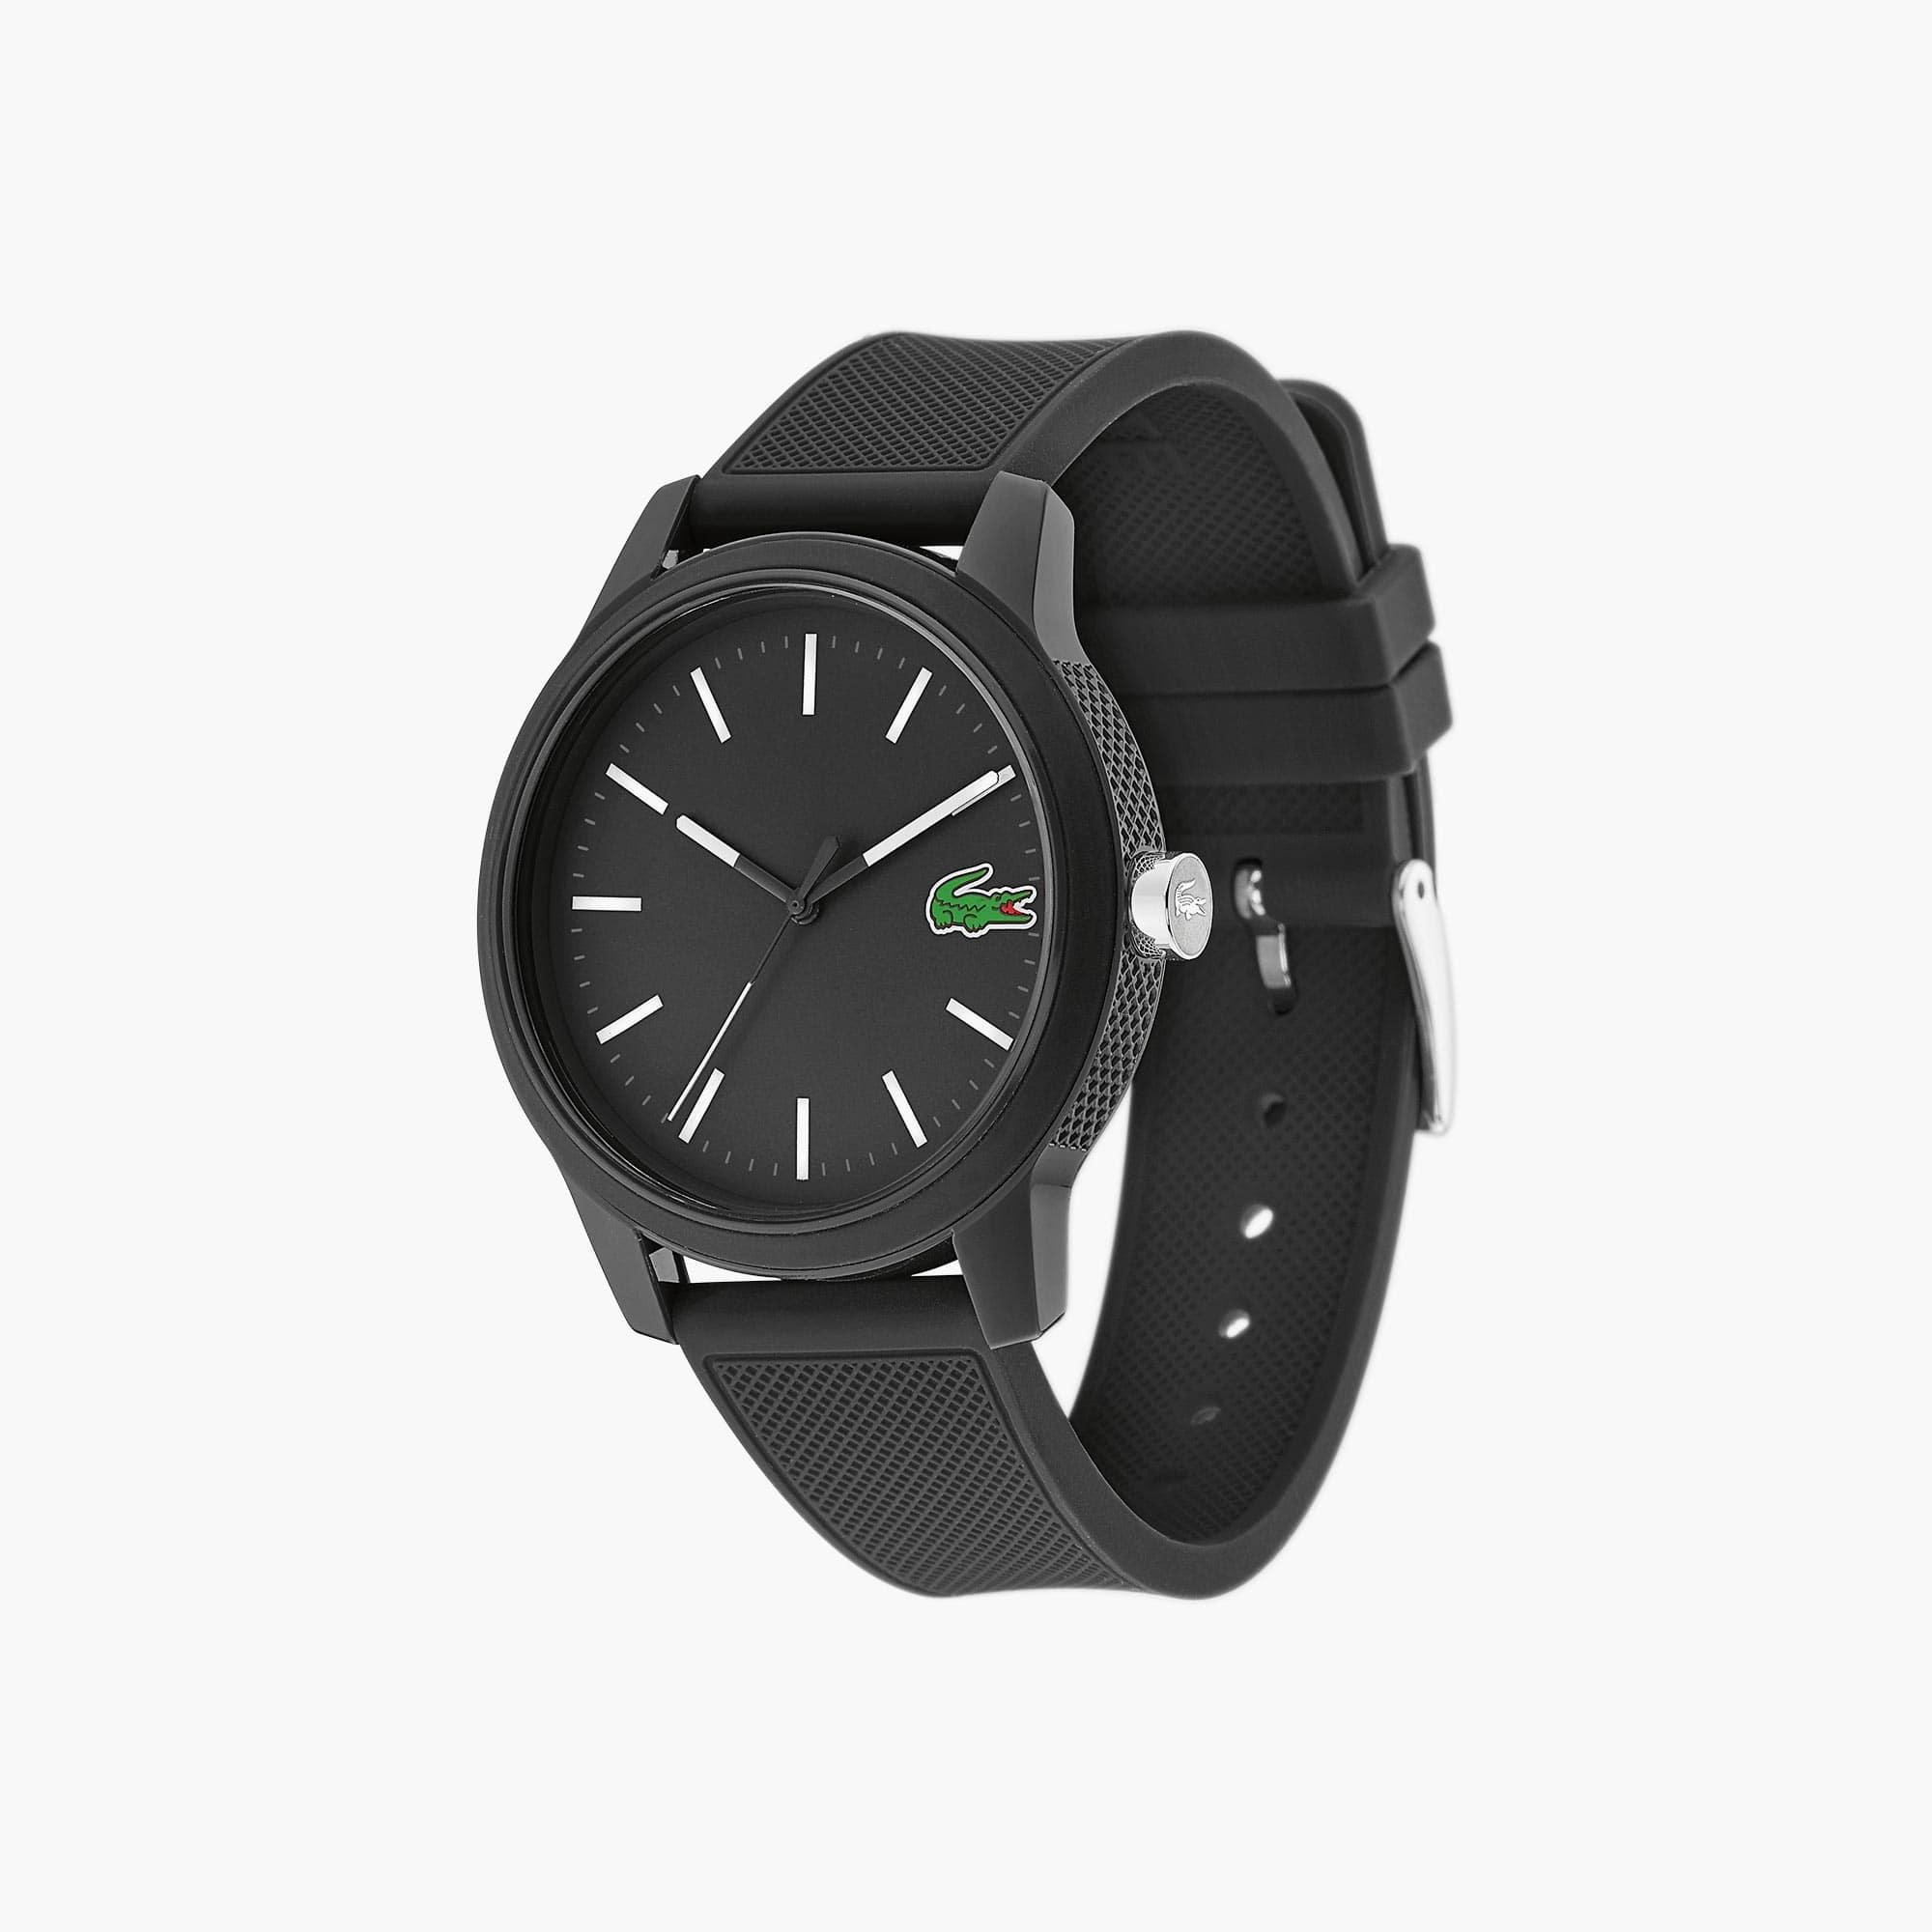 Reloj de Hombre Lacoste 12.12 con Correa de Silicona Negra